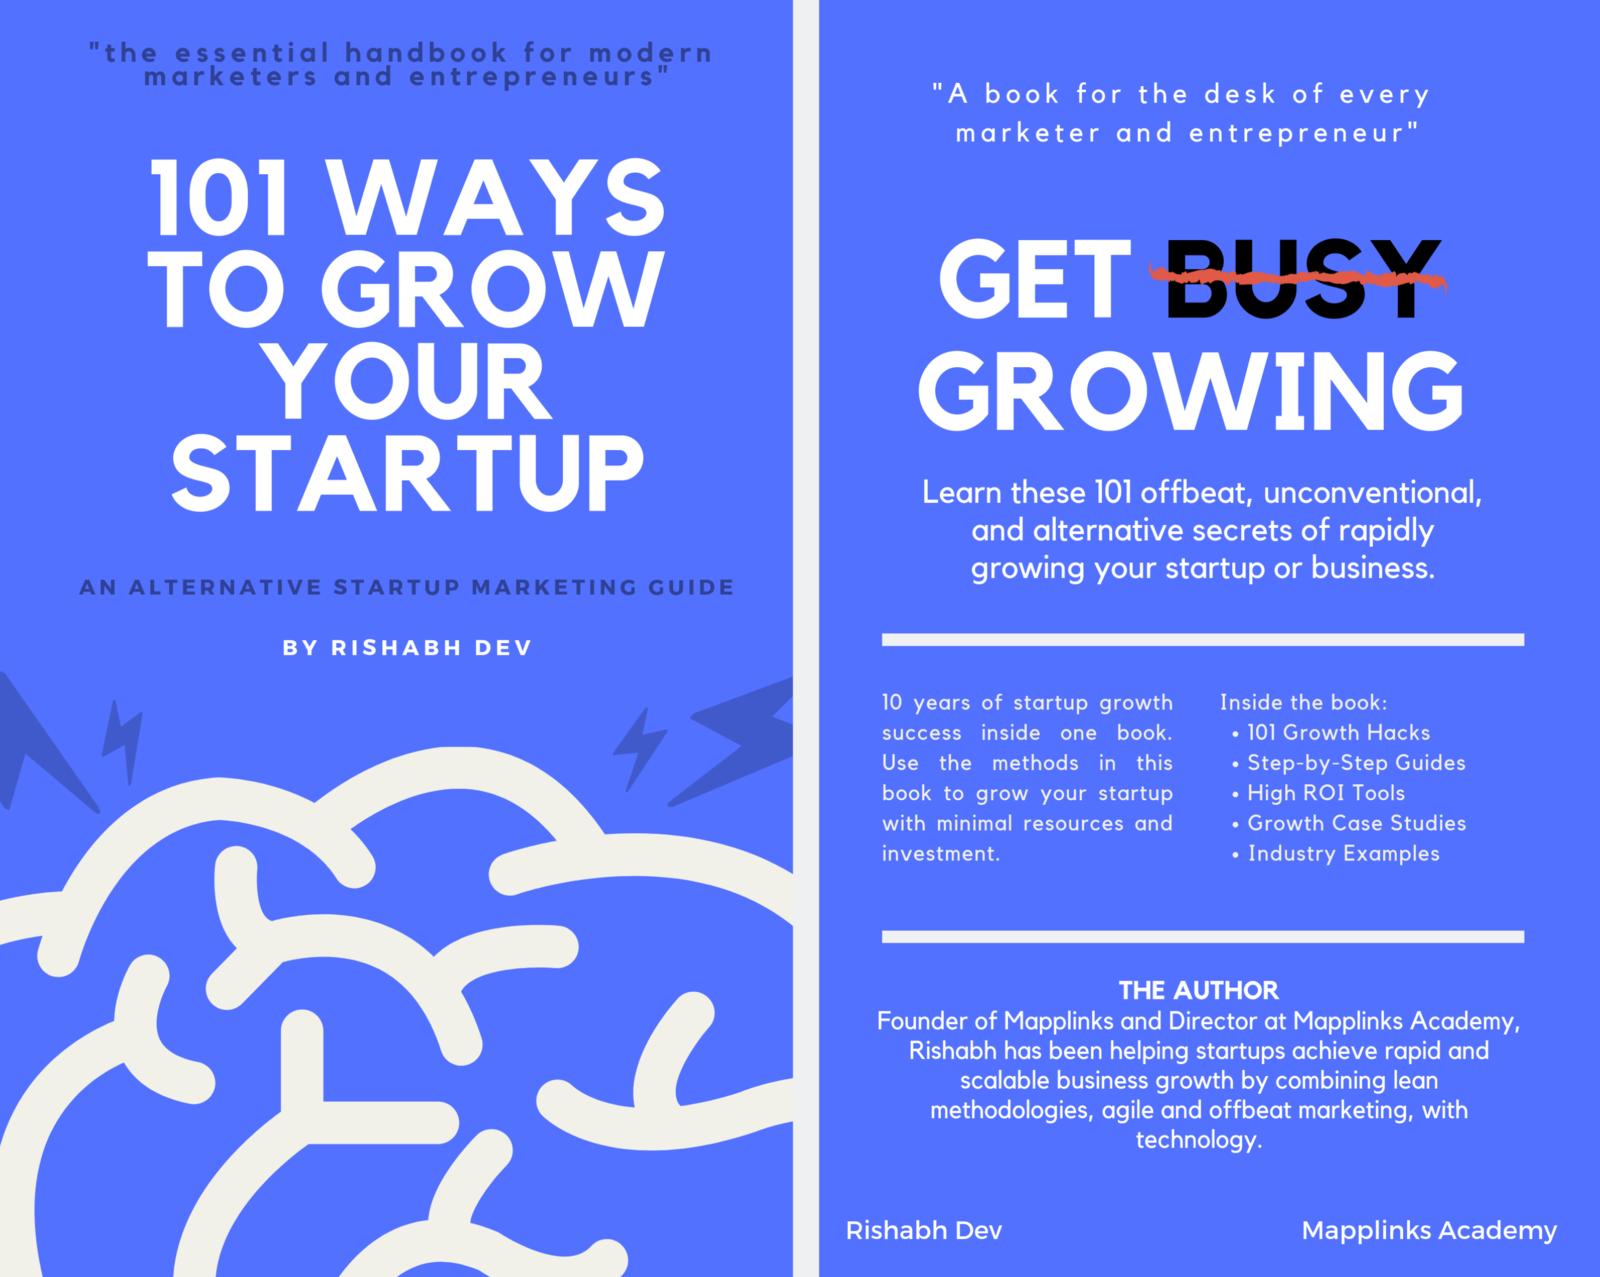 Business Hacks: A Guide for Start-ups and Entrepreneurs